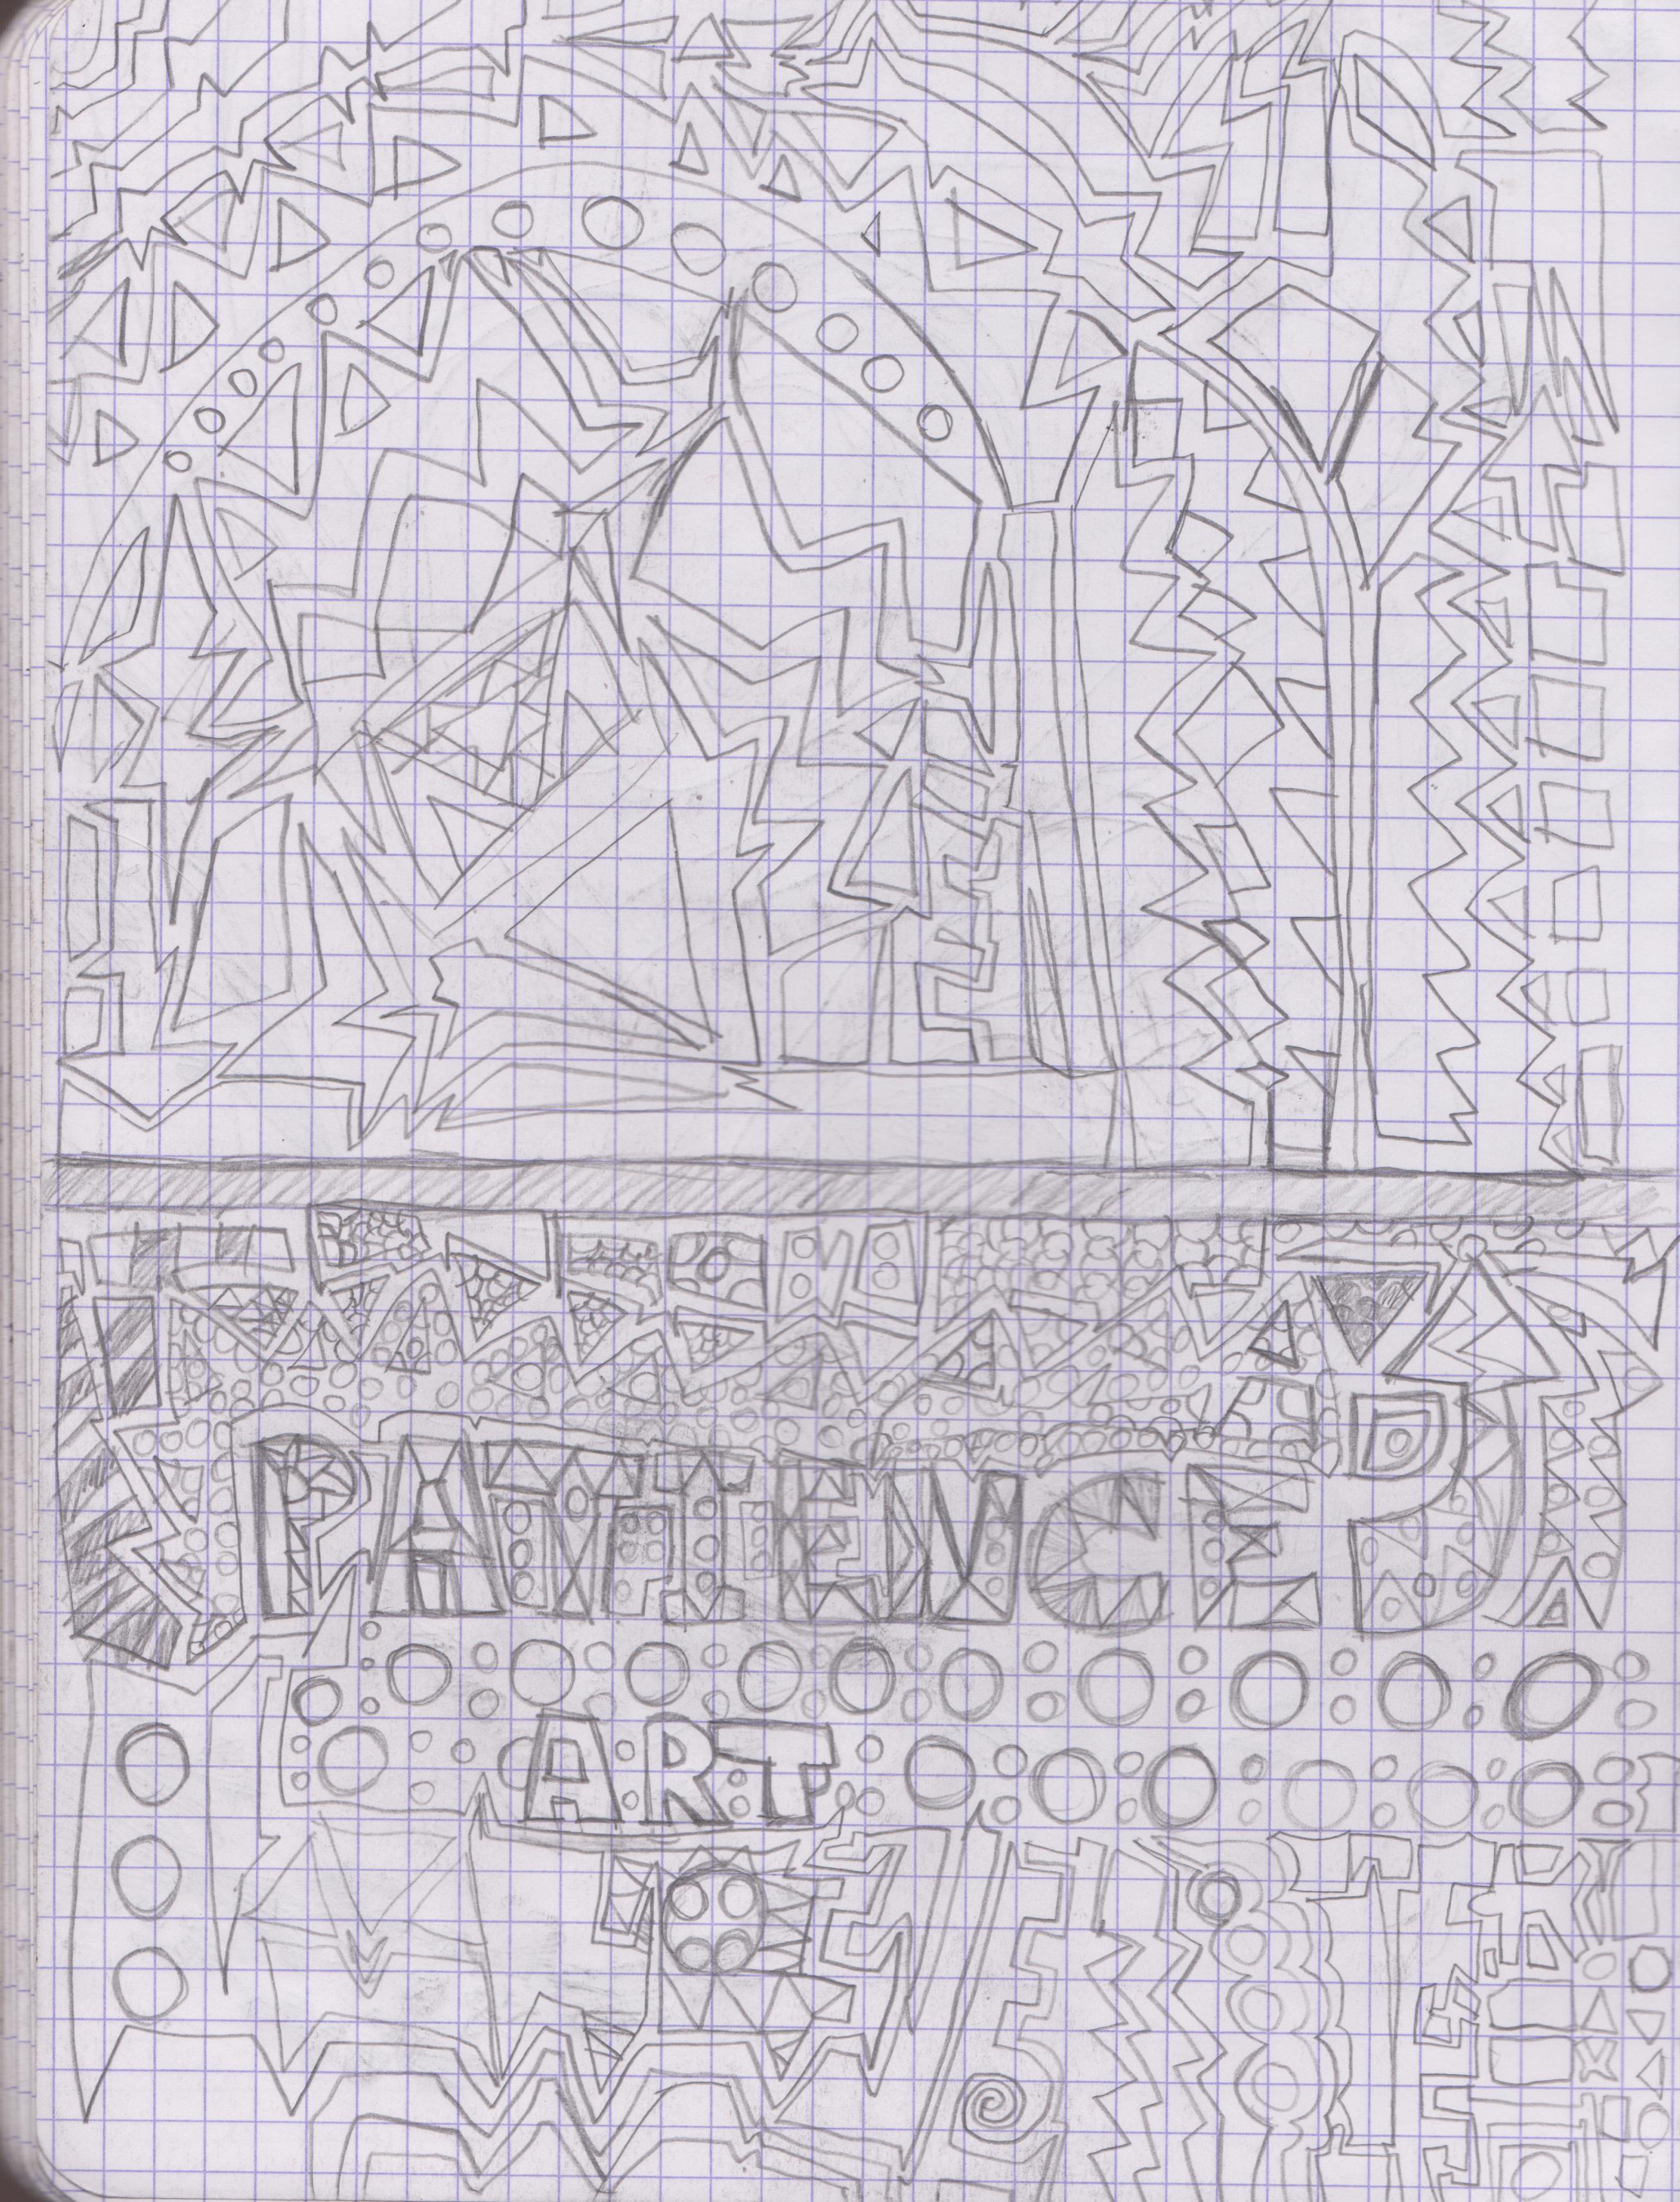 SH sketchbook page 32